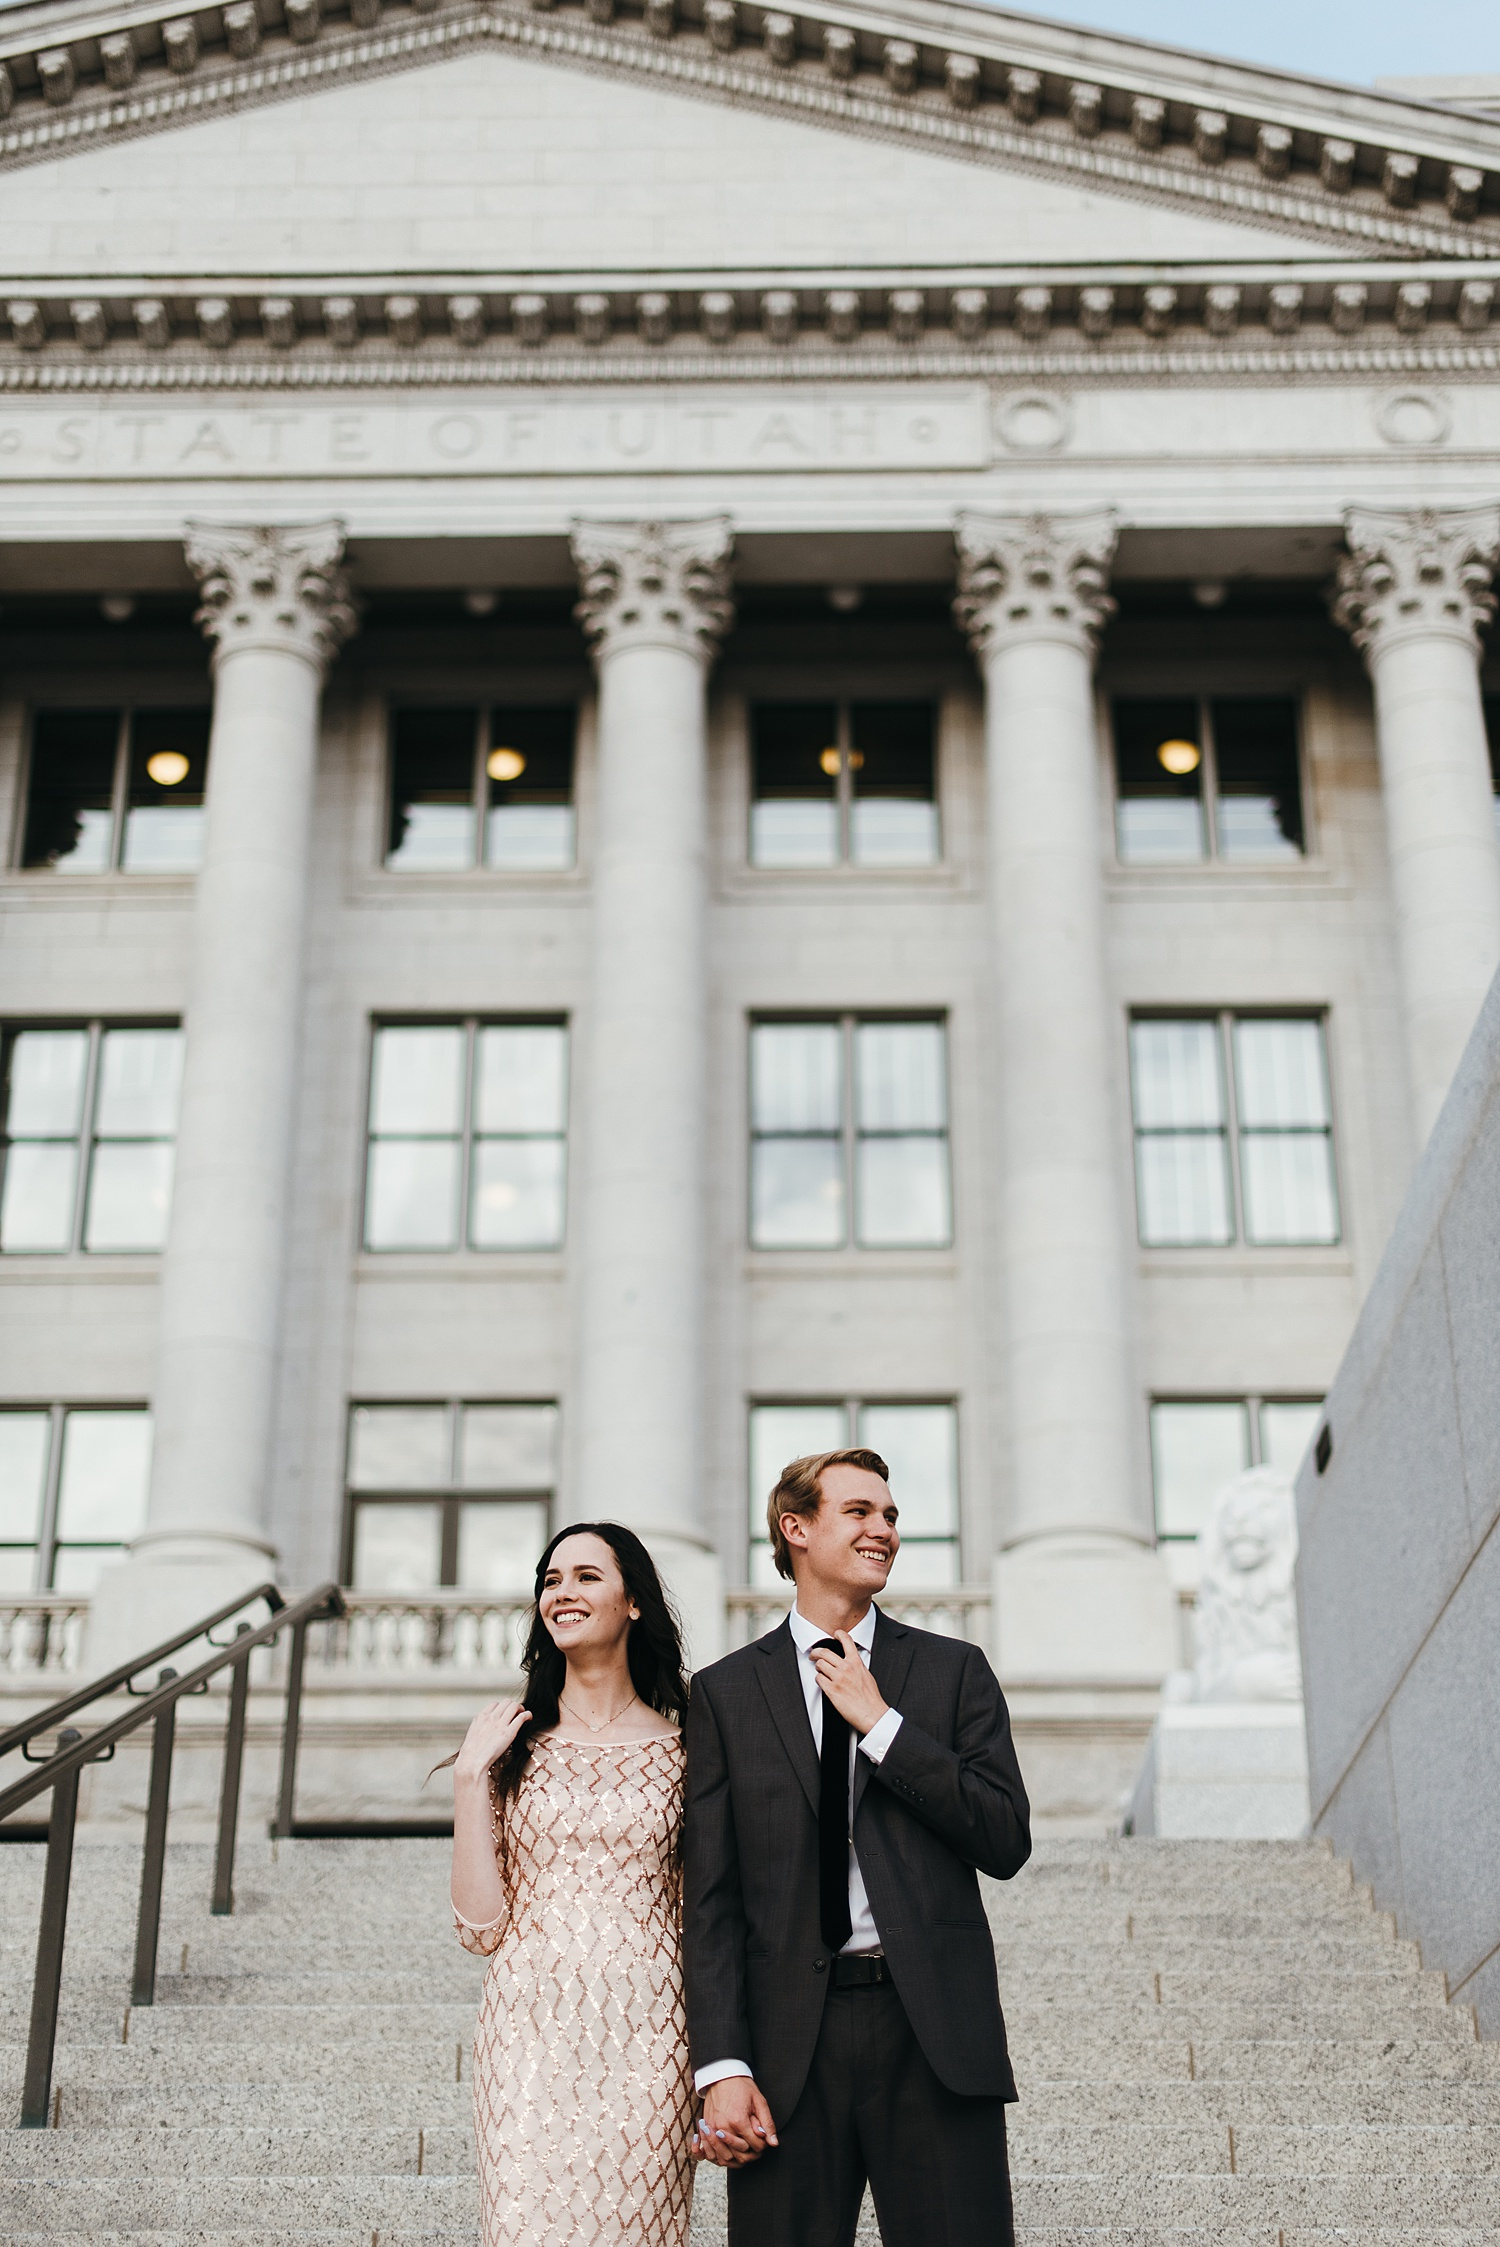 Zandra Barriga Photo - Alex and McKenna Utah State Capitol Blossom Engagements_0013.jpg